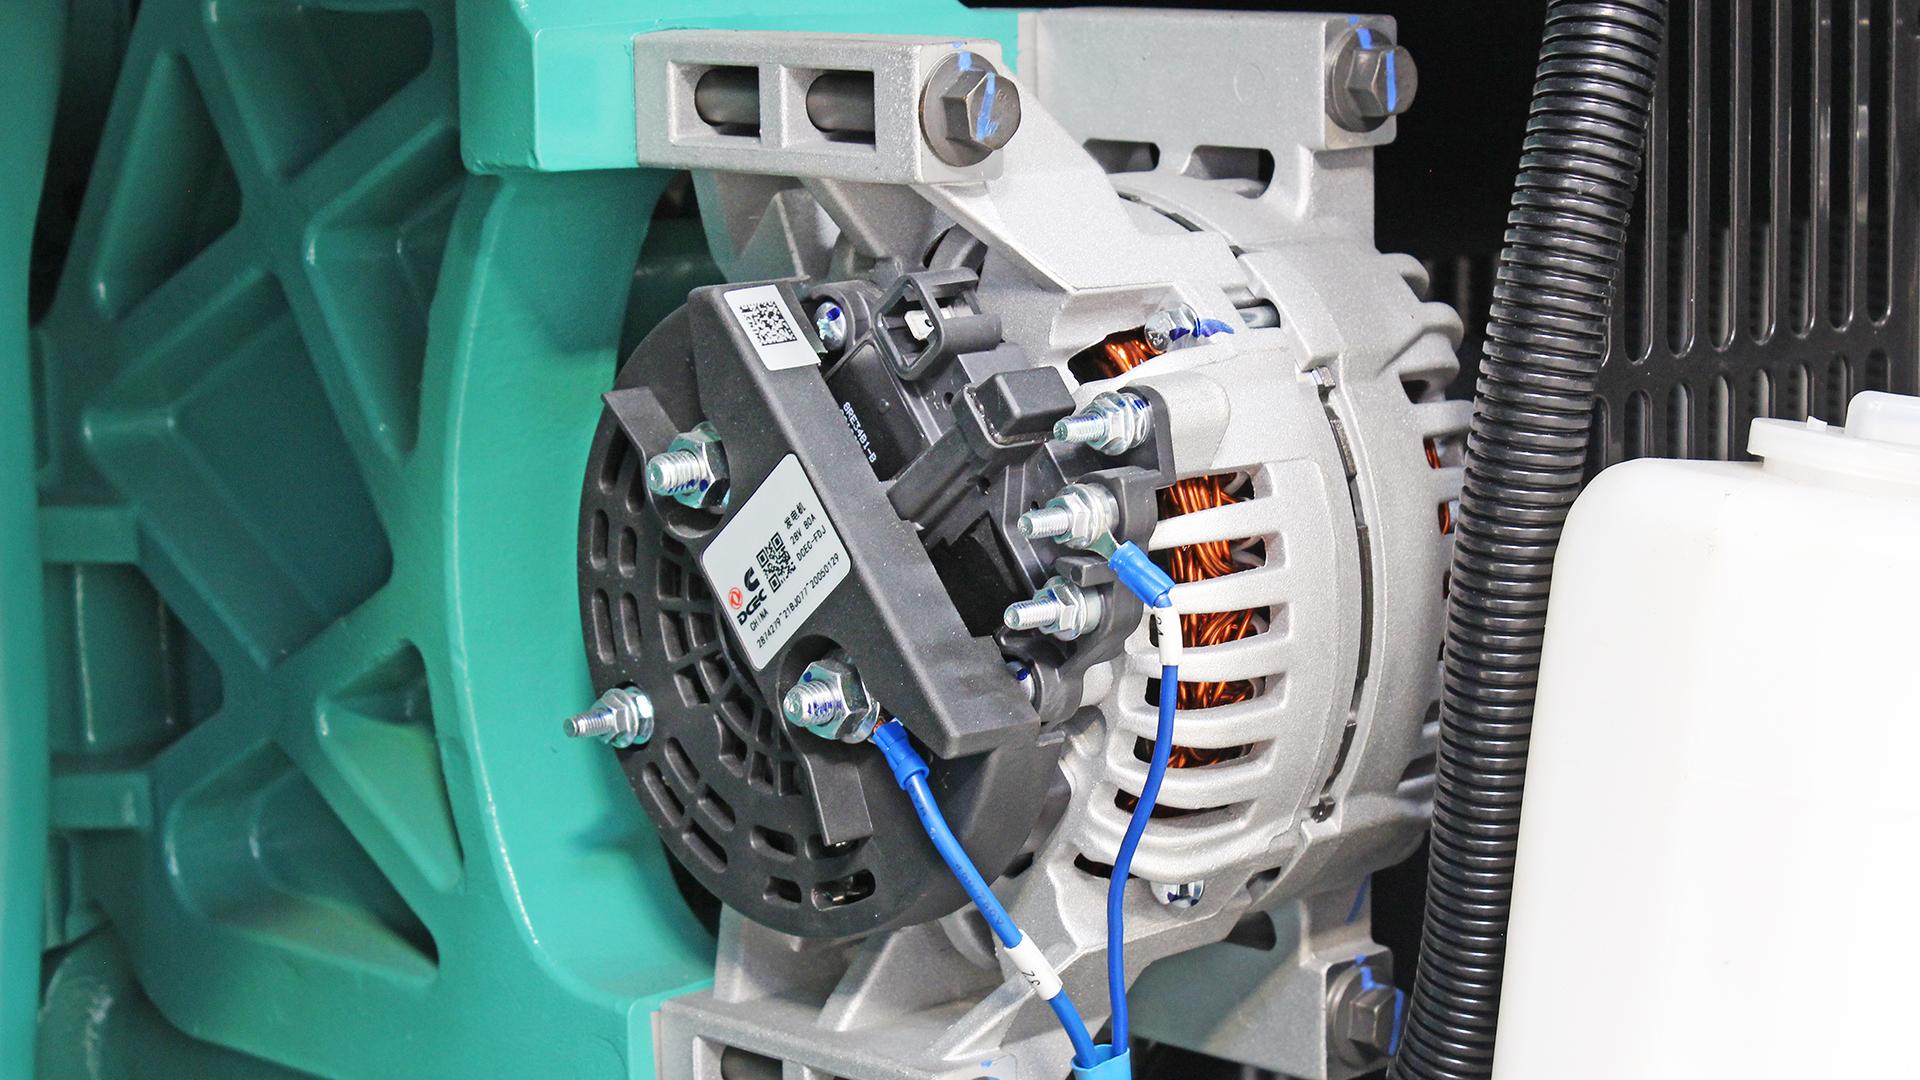 480kVA Generator with Cummins engine, showing the battery charging alternator